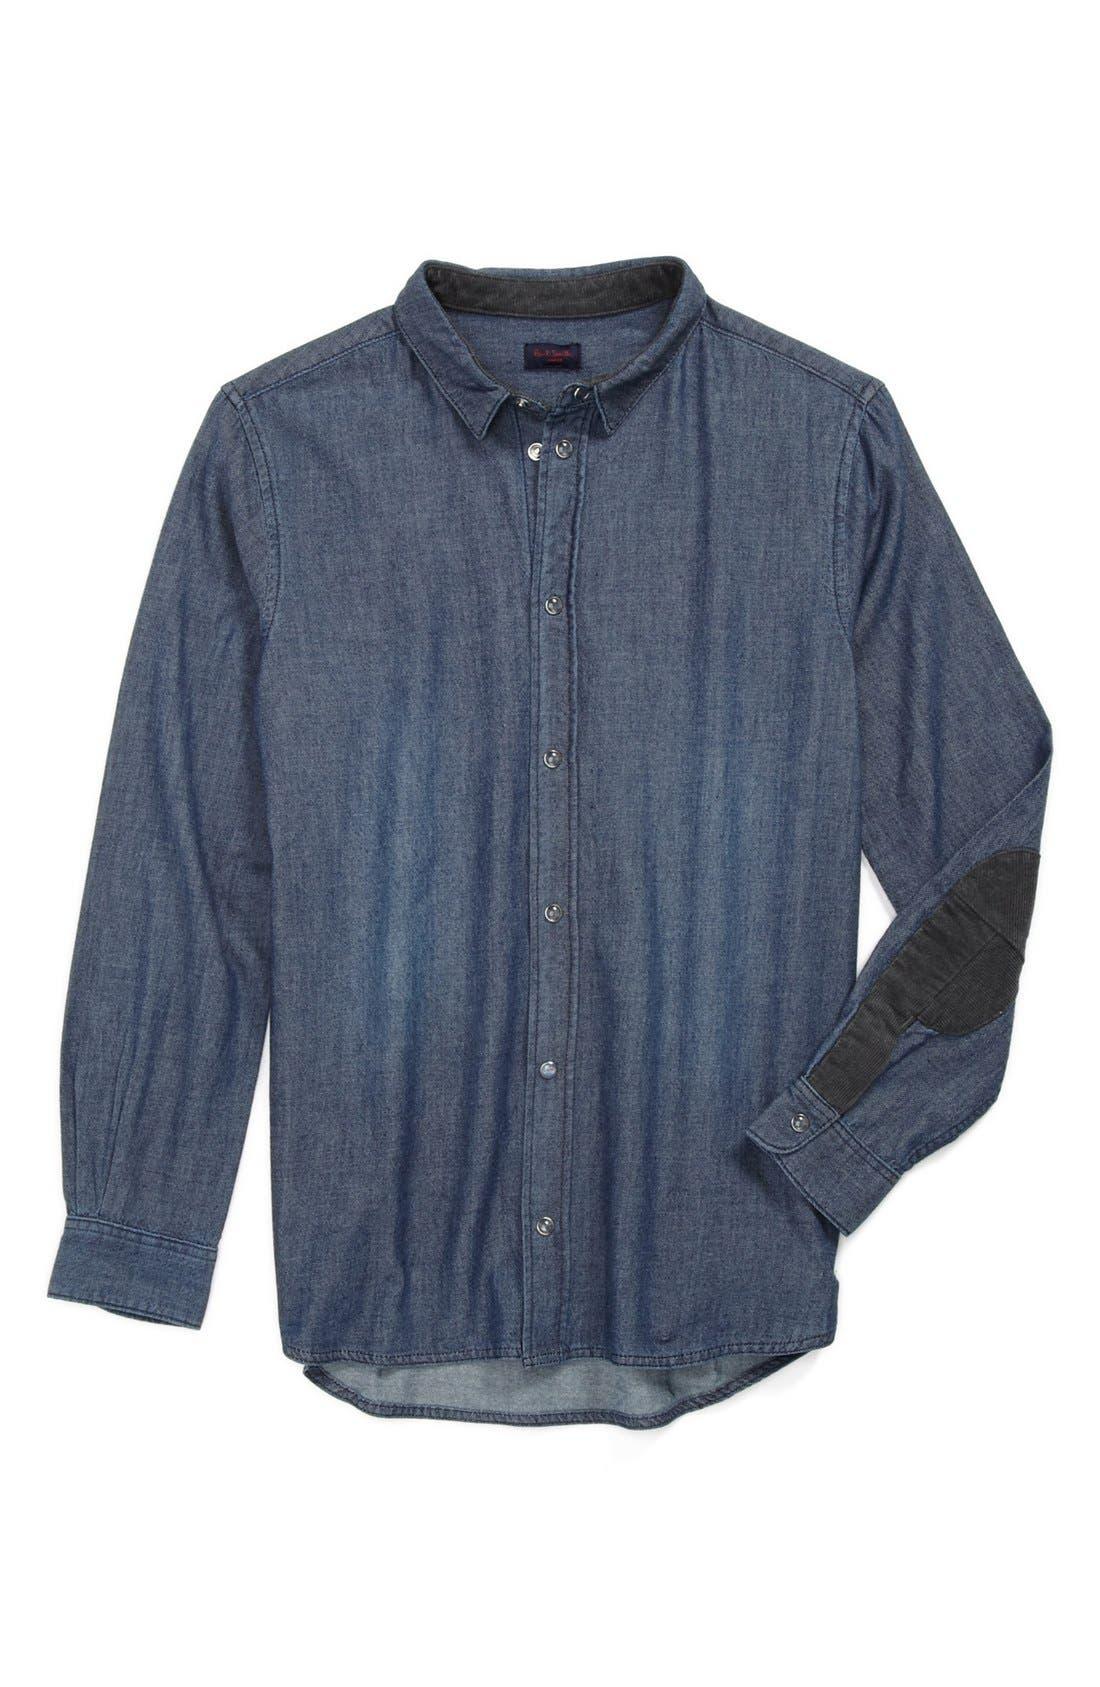 Main Image - Paul Smith Junior 'Enock' Denim Shirt (Little Boys & Big Boys)